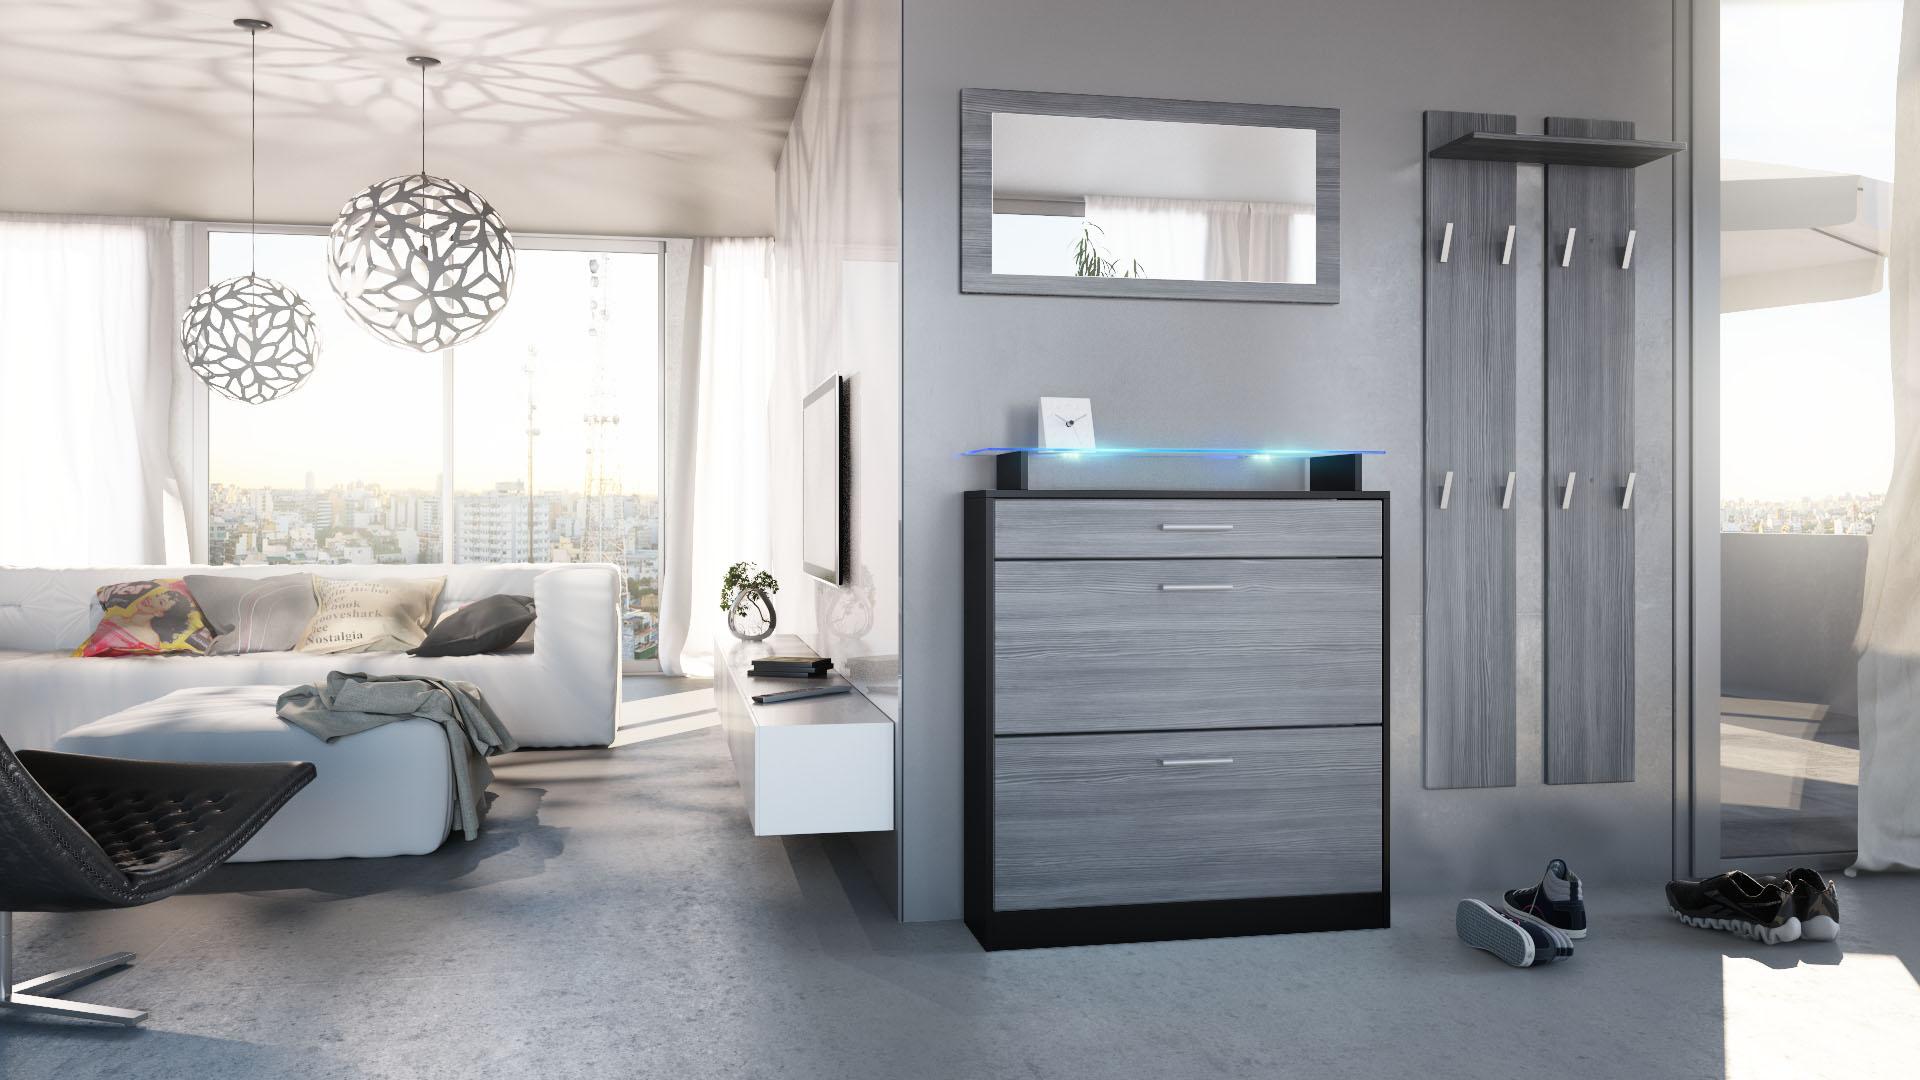 garderobenset garderobe schuhschrank loret mini schwarz hochglanz naturt ne ebay. Black Bedroom Furniture Sets. Home Design Ideas